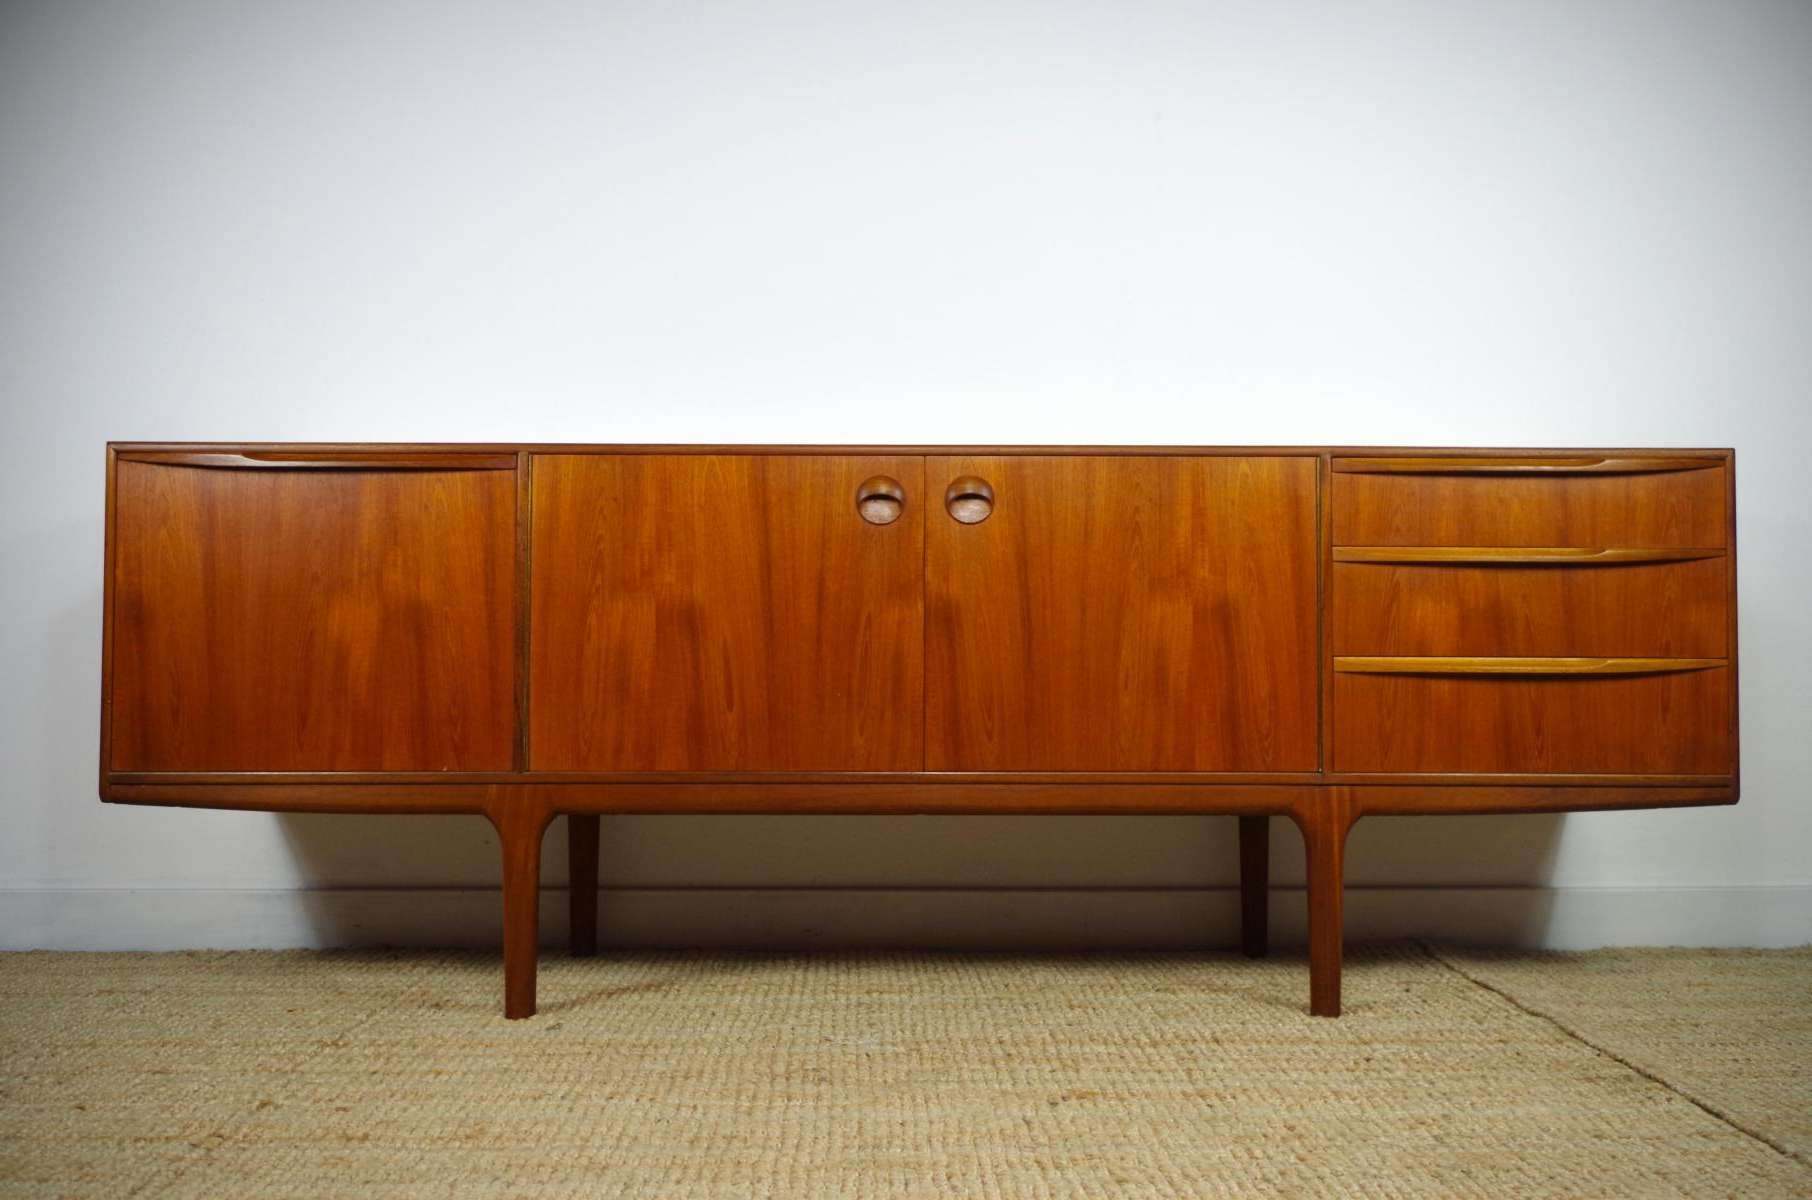 Mid Century Sideboardtom Robertson For Mcintosh For Sale At Pamono With Mid Century Sideboards (View 20 of 20)